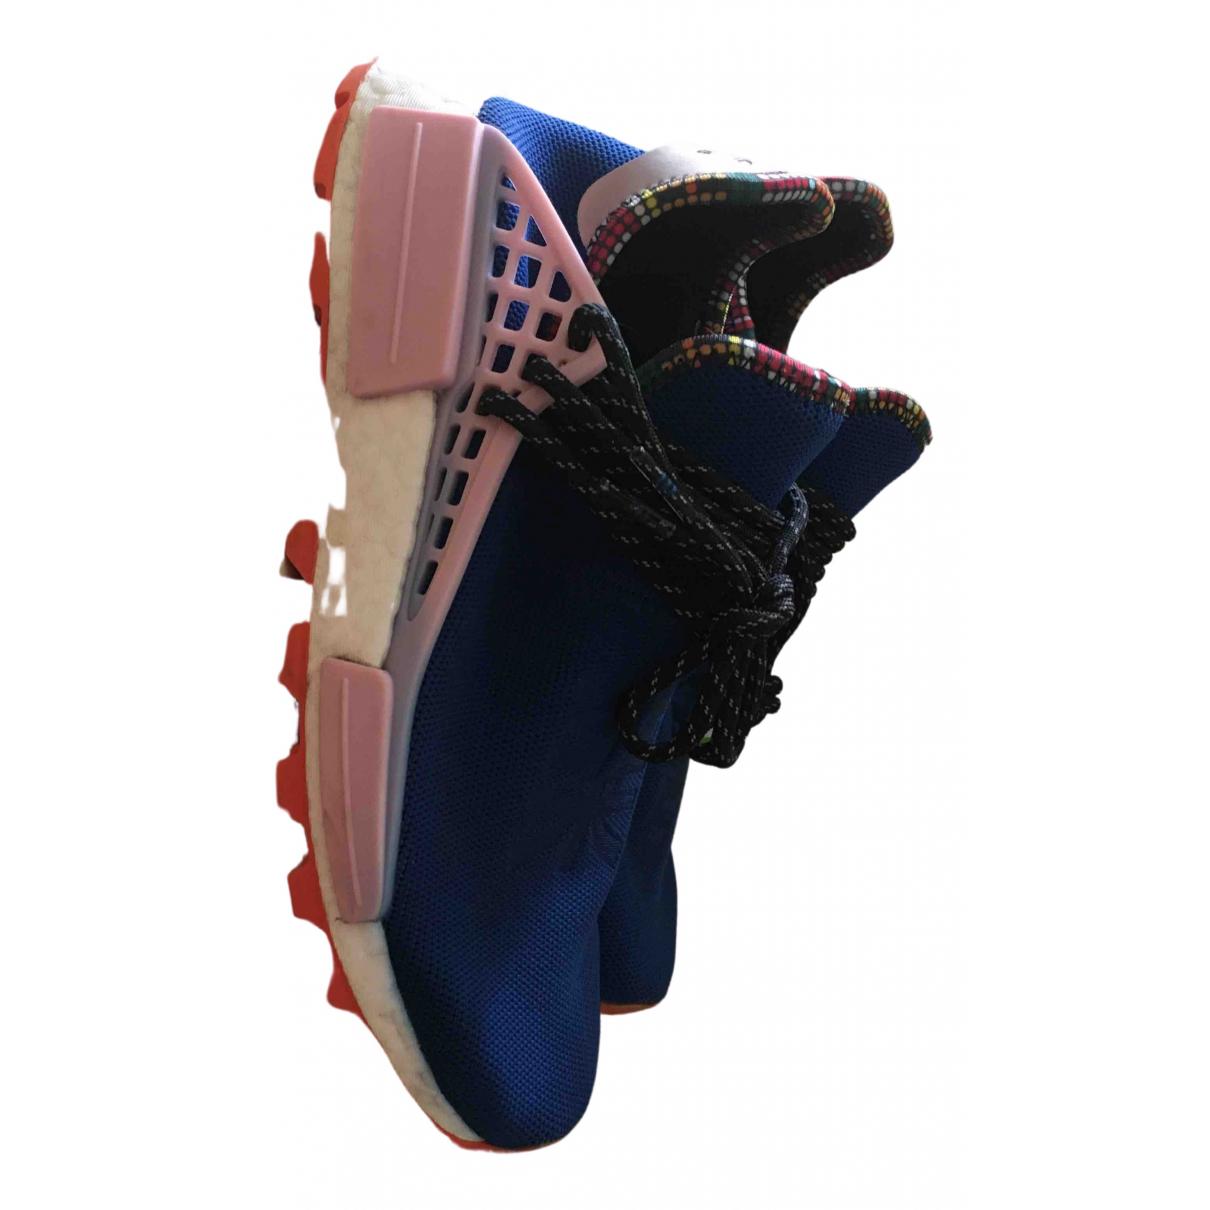 Adidas X Pharrell Williams - Baskets NMD Hu pour homme en toile - bleu